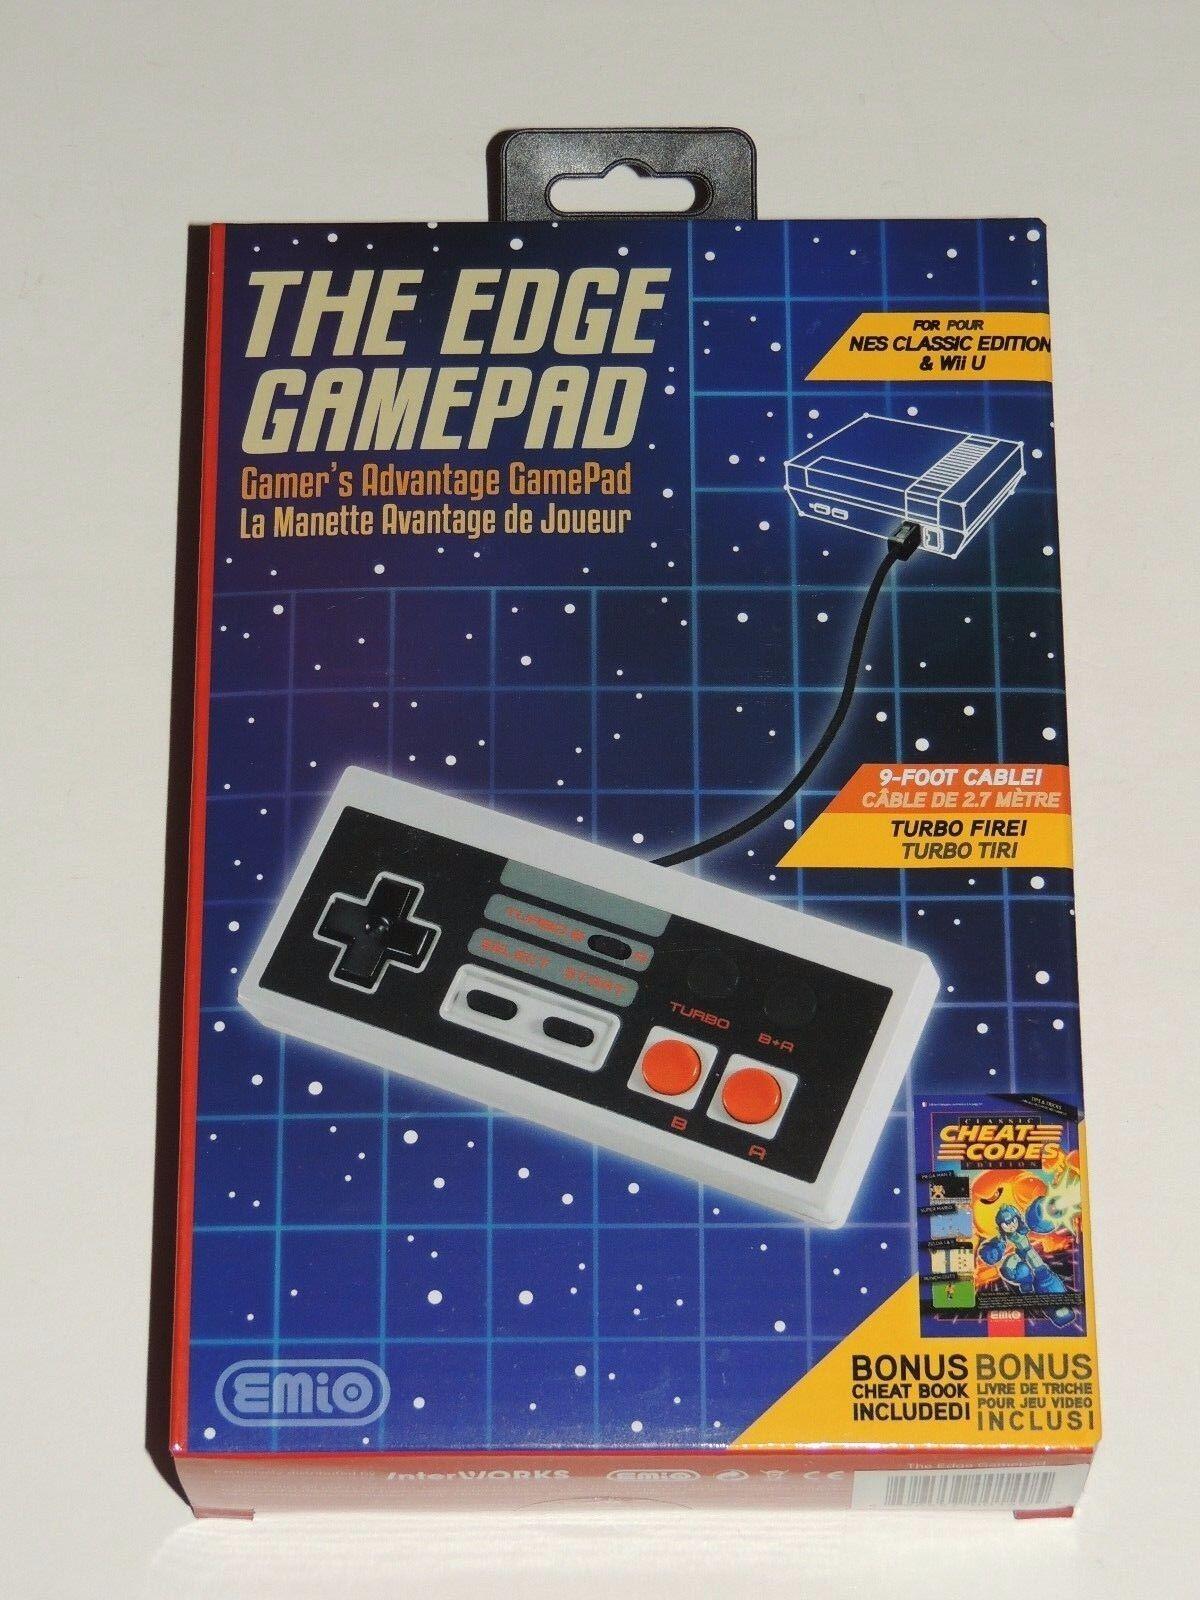 THE EDGE GAMEPAD FOR NES CLASSIC EDITION & WII U CONSOLE *BONUS CHEAT BOOK!*